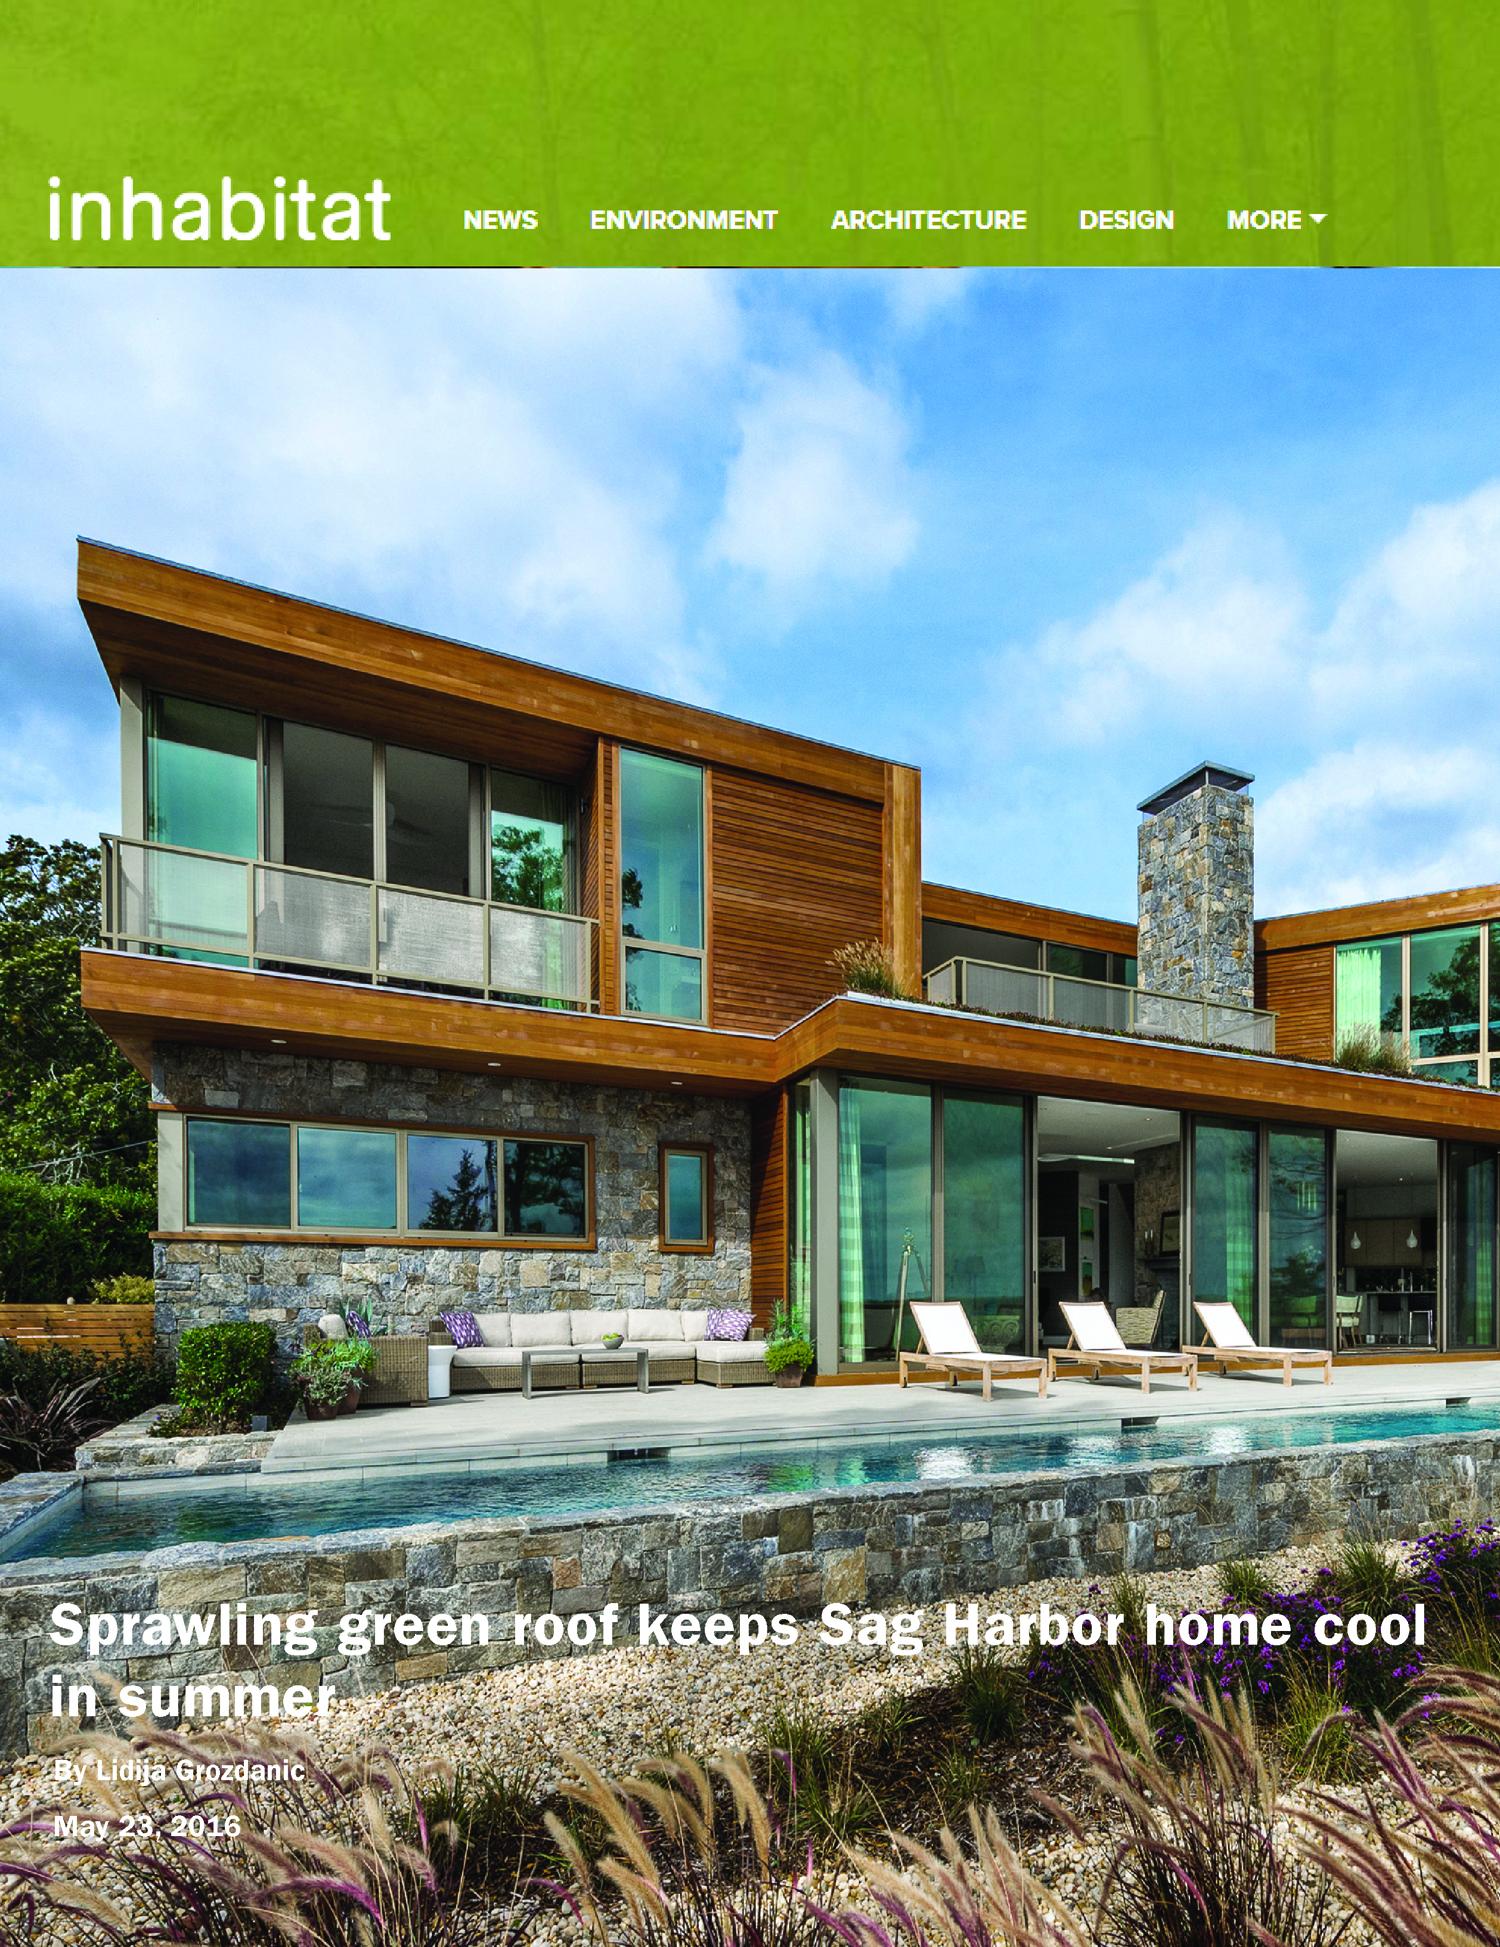 Inhabitat  May 23 2016                Sprawling Green Roof Keeps Sag Harbor Home Cool in Summer